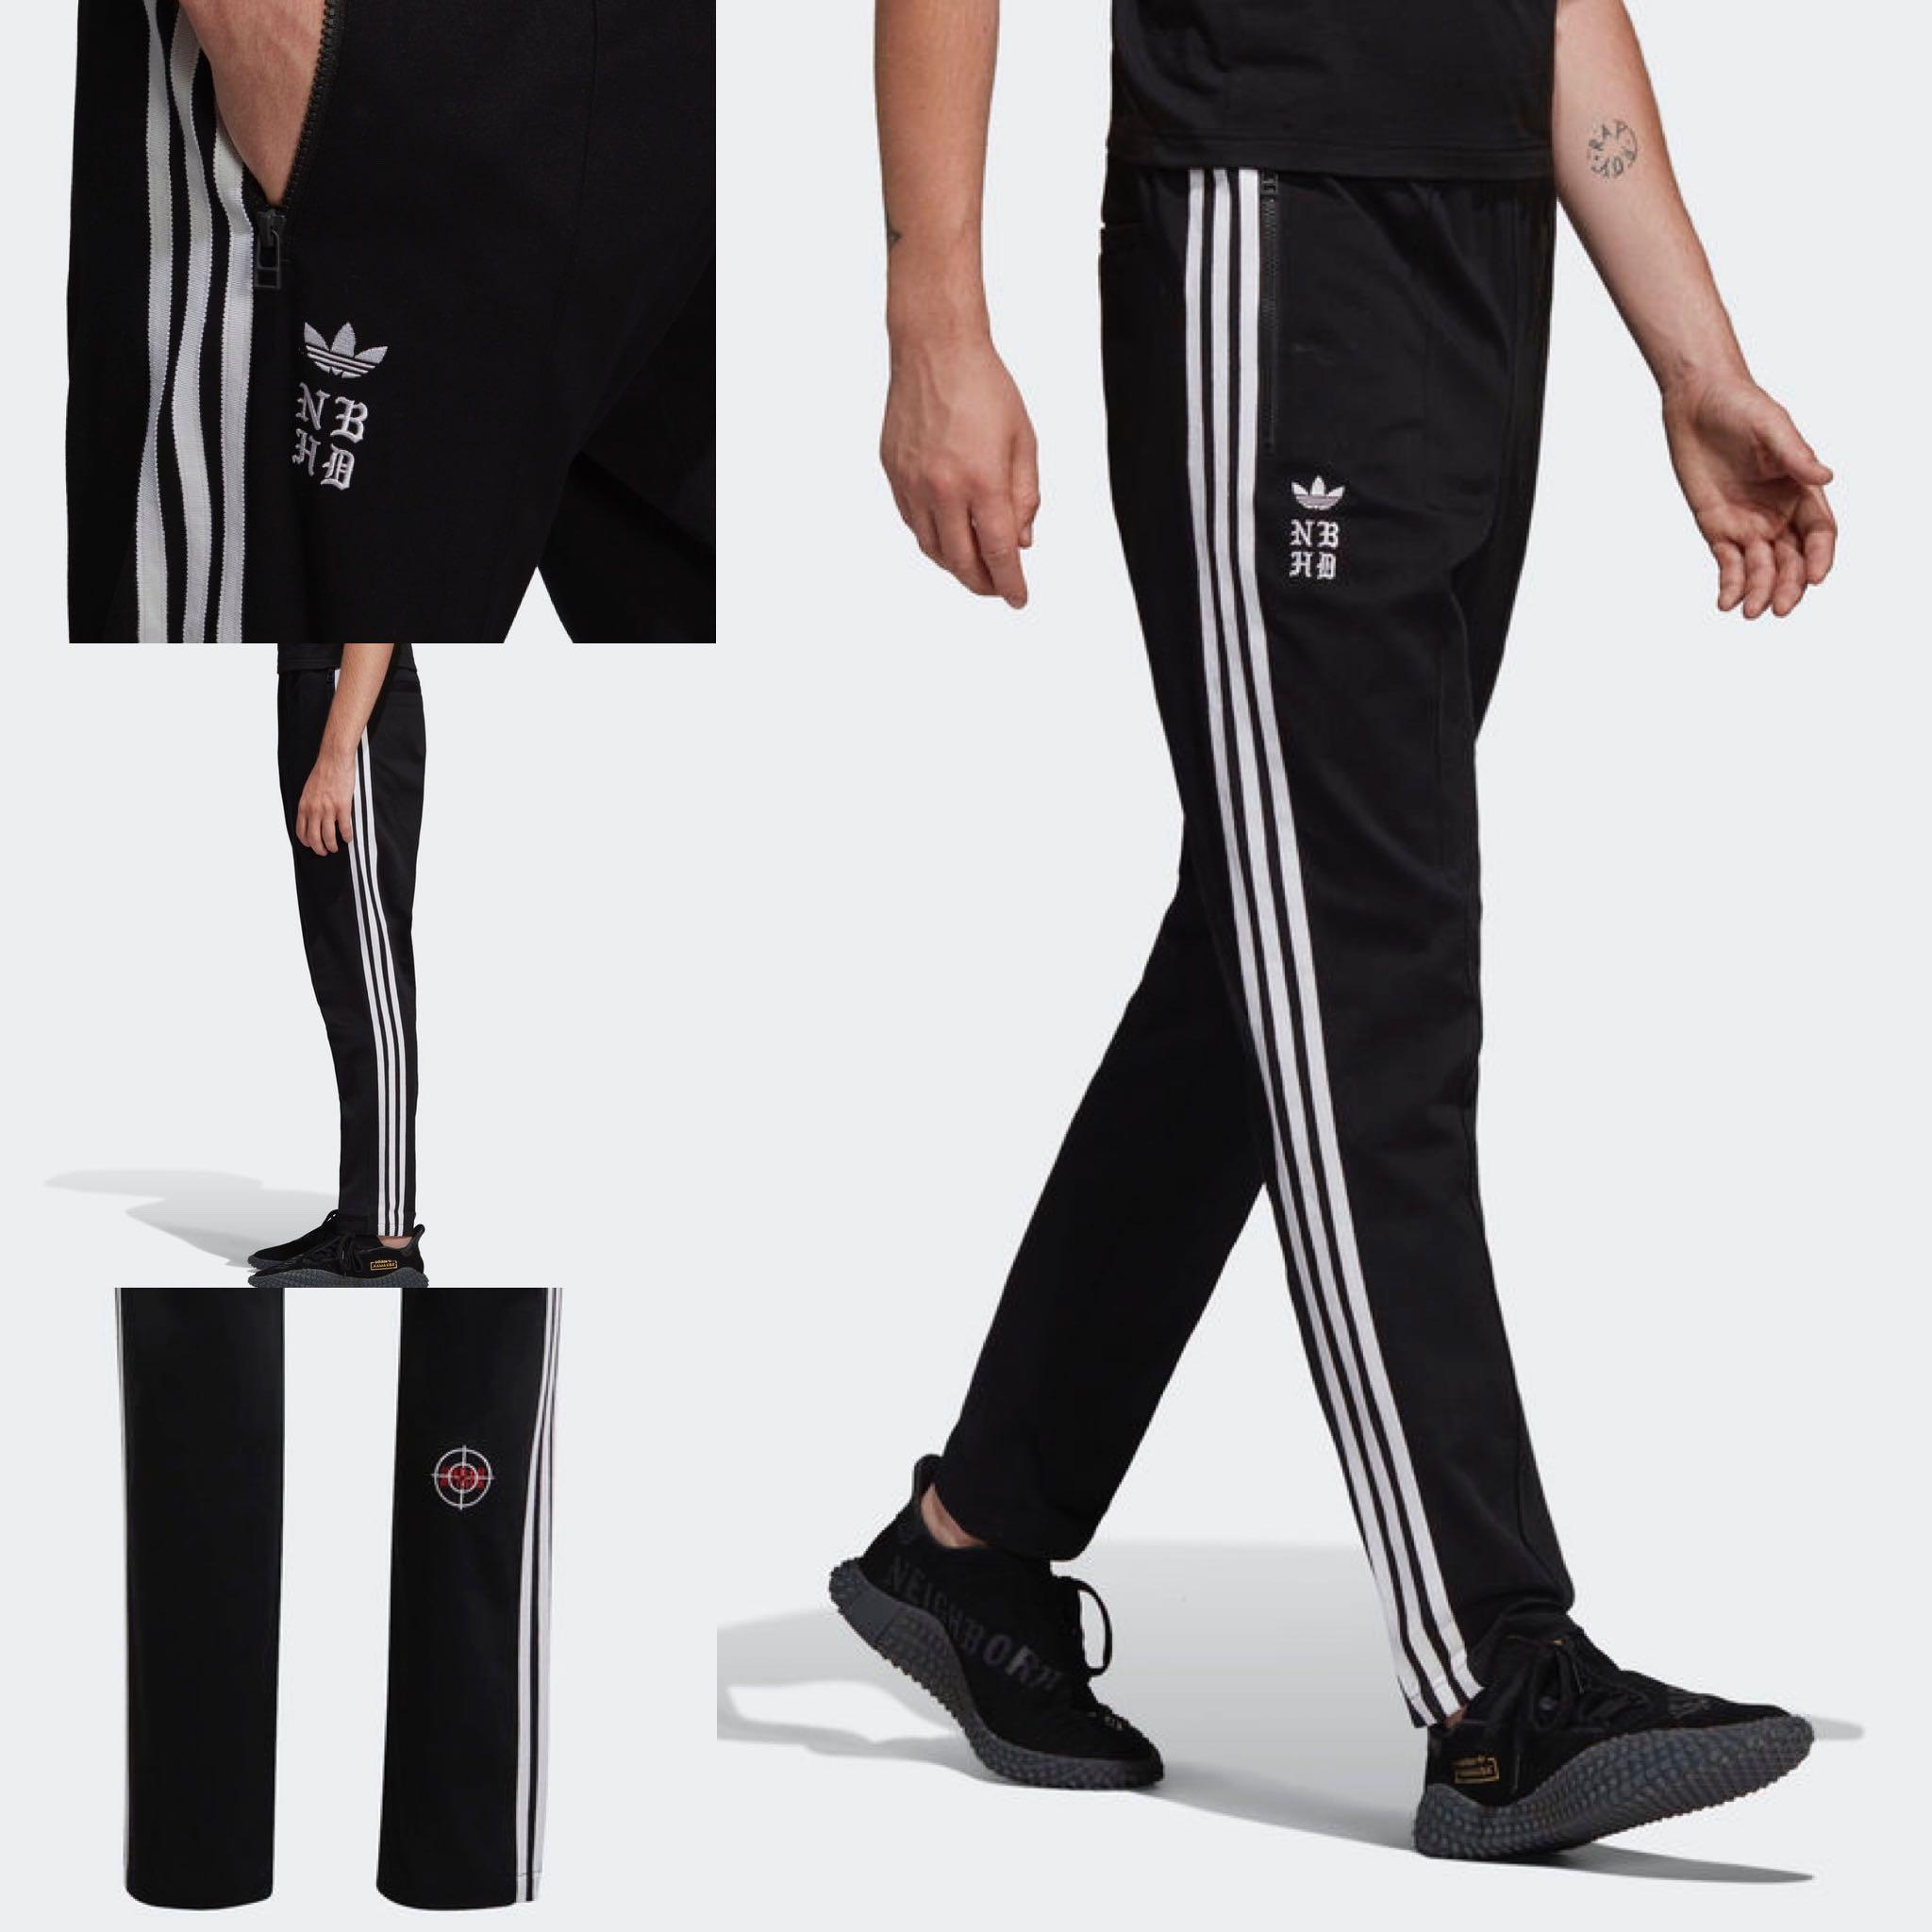 9e01e33ad6a9 Adidas Neighborhood TRACK PANTS - BLACK